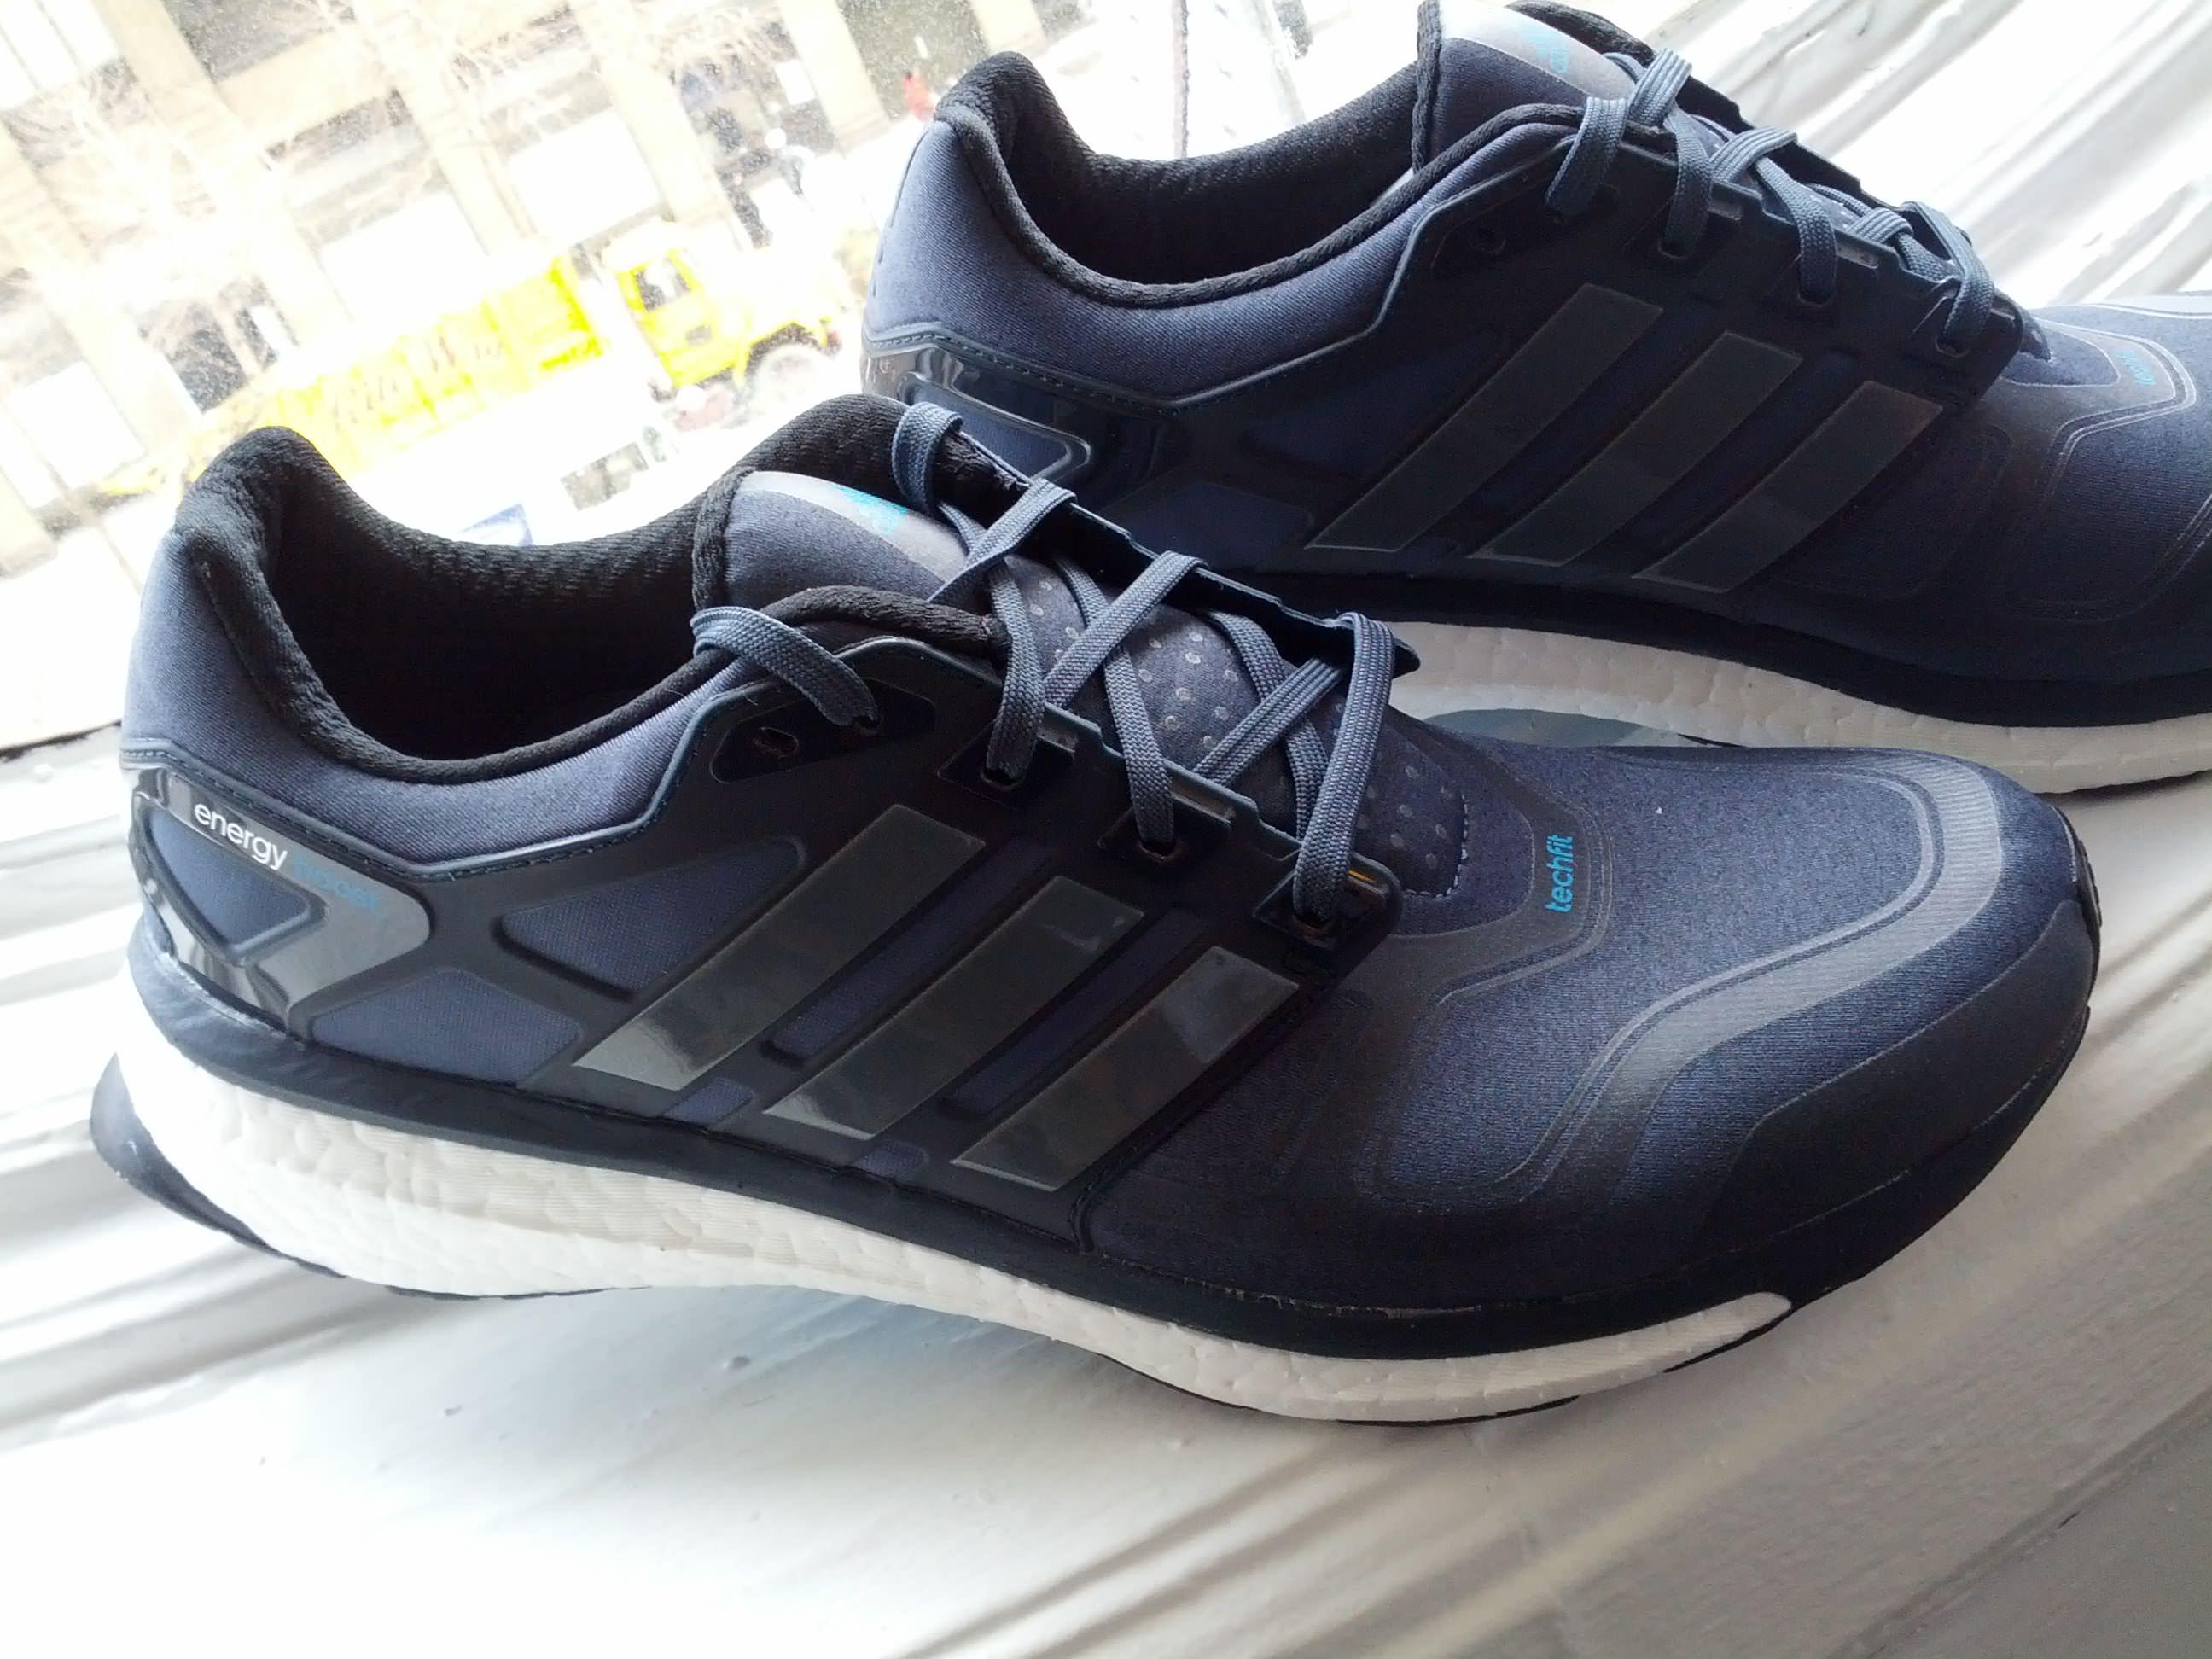 Adidas Energy Boost 2 ATR patika za asfalt i offroad Patike za trčanje